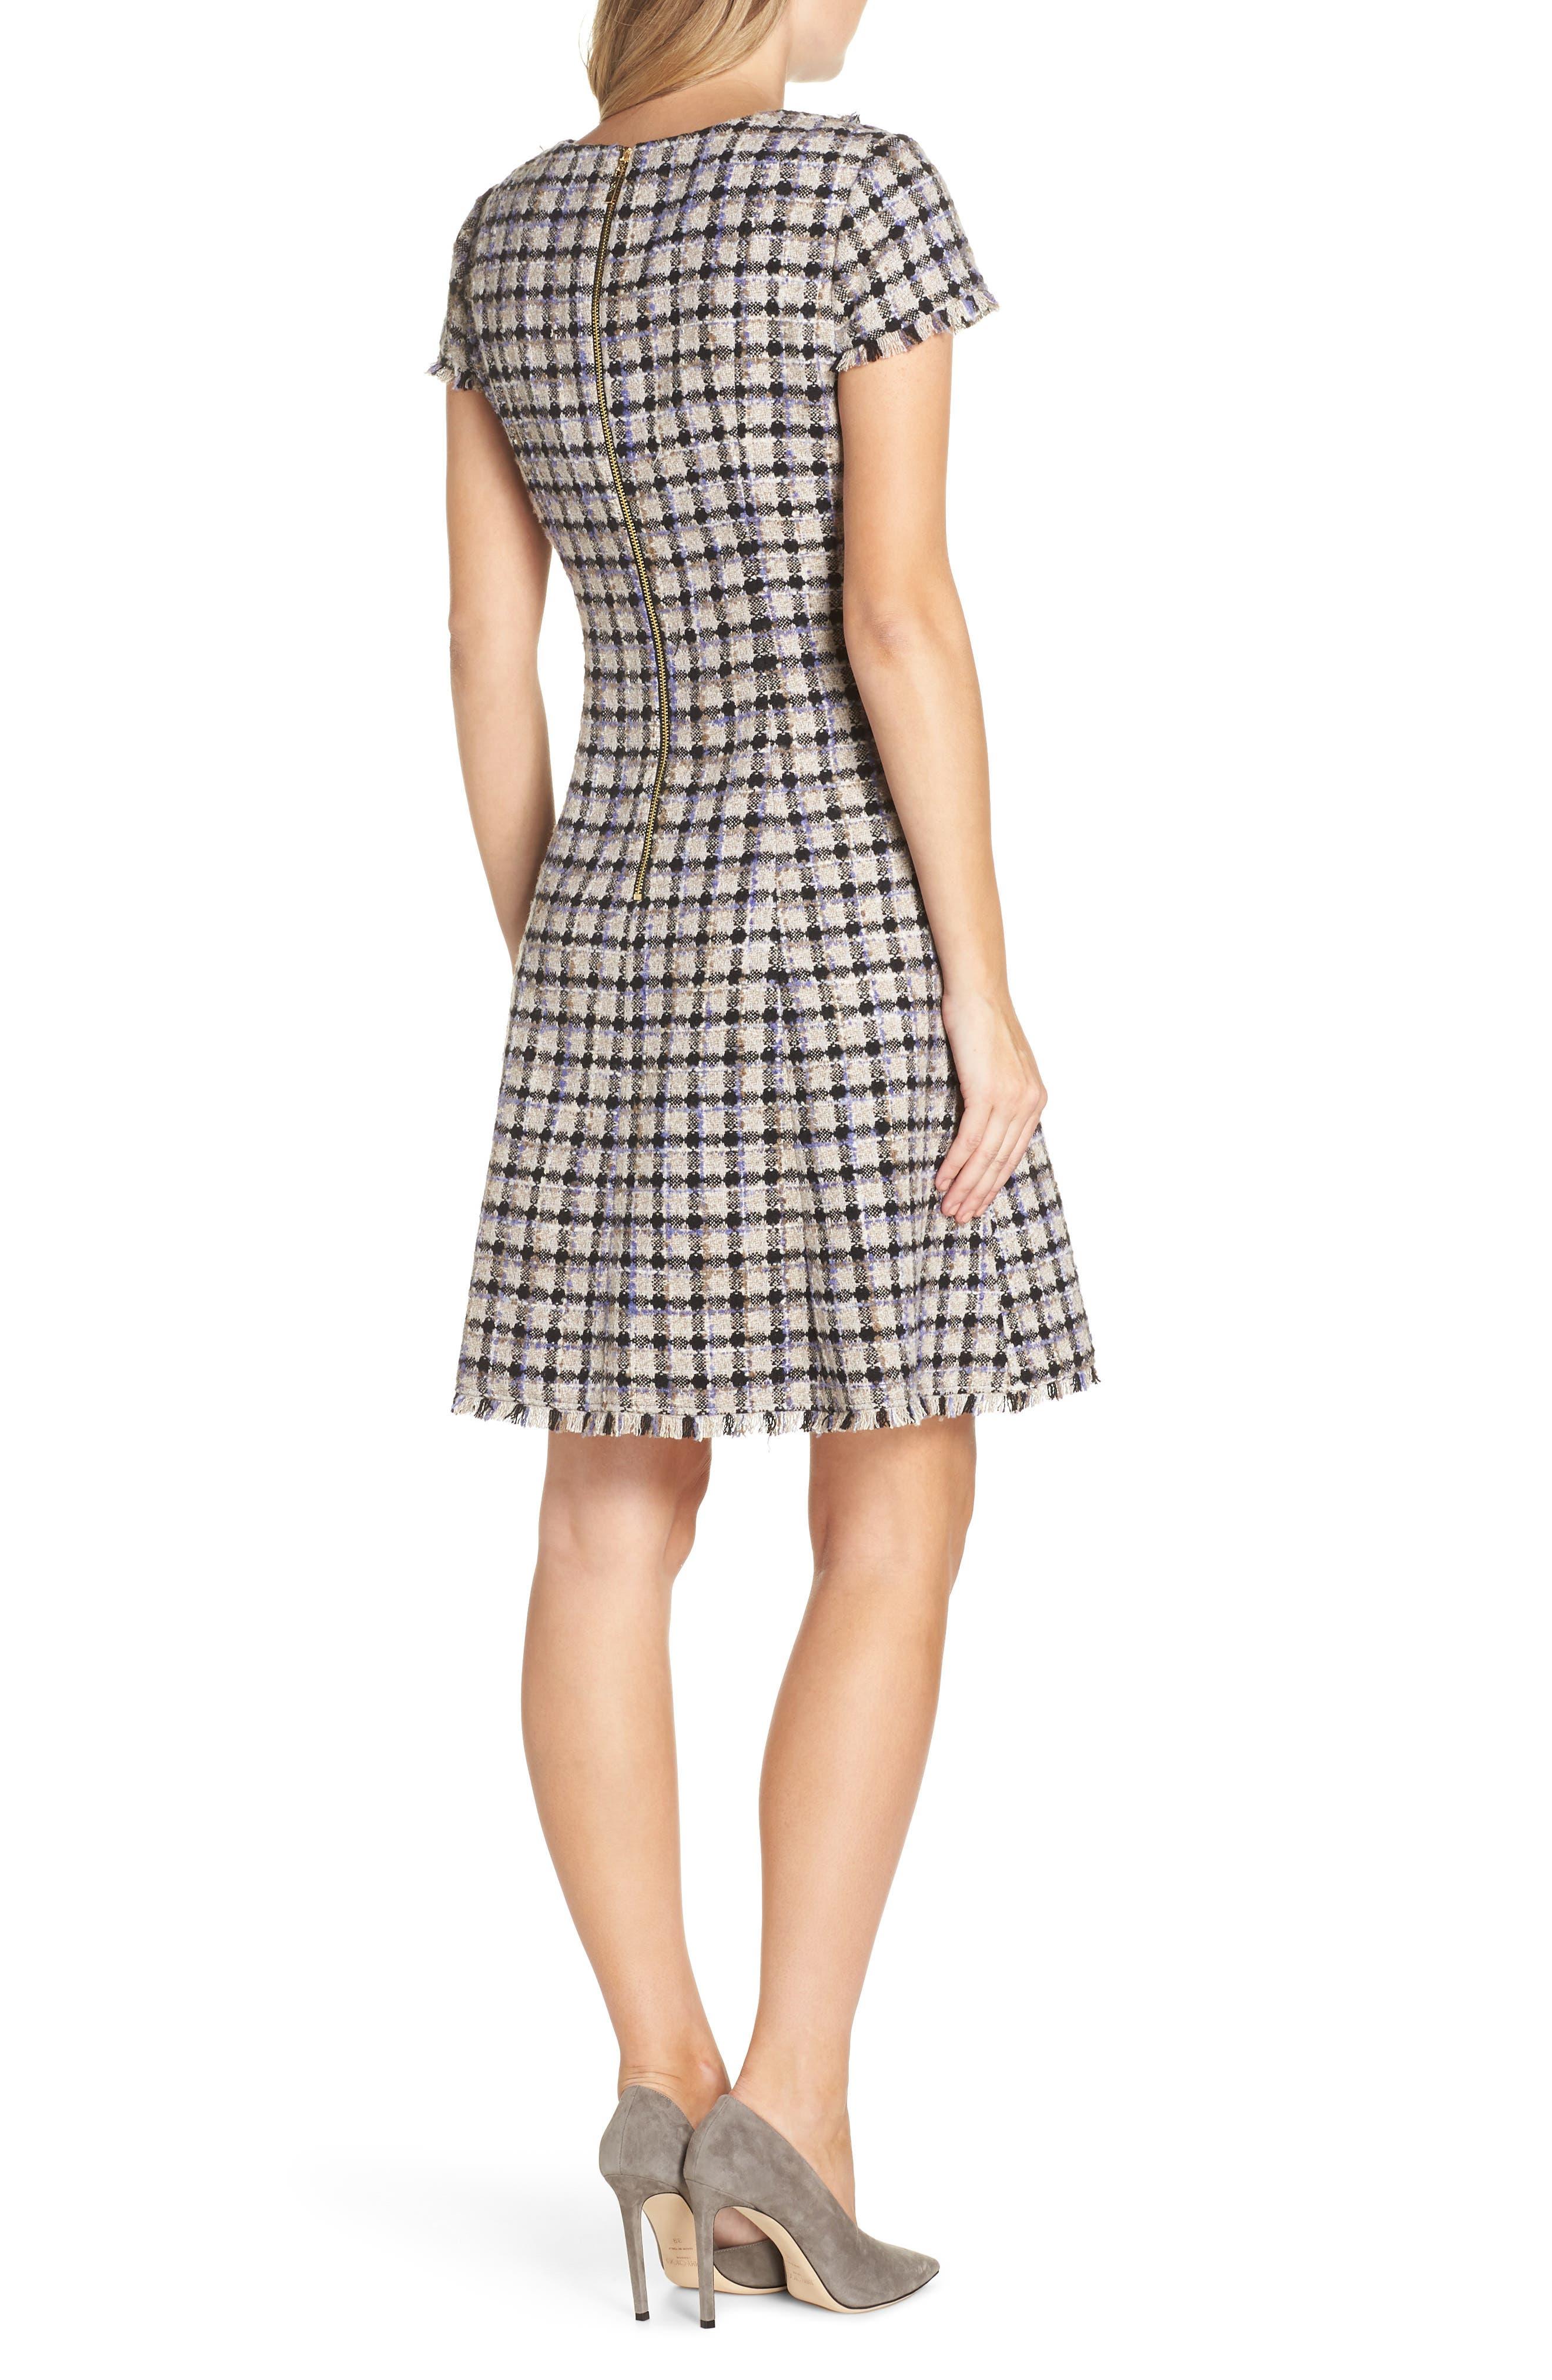 ELIZA J, Cap Sleeve Fit & Flare Dress, Alternate thumbnail 2, color, 900